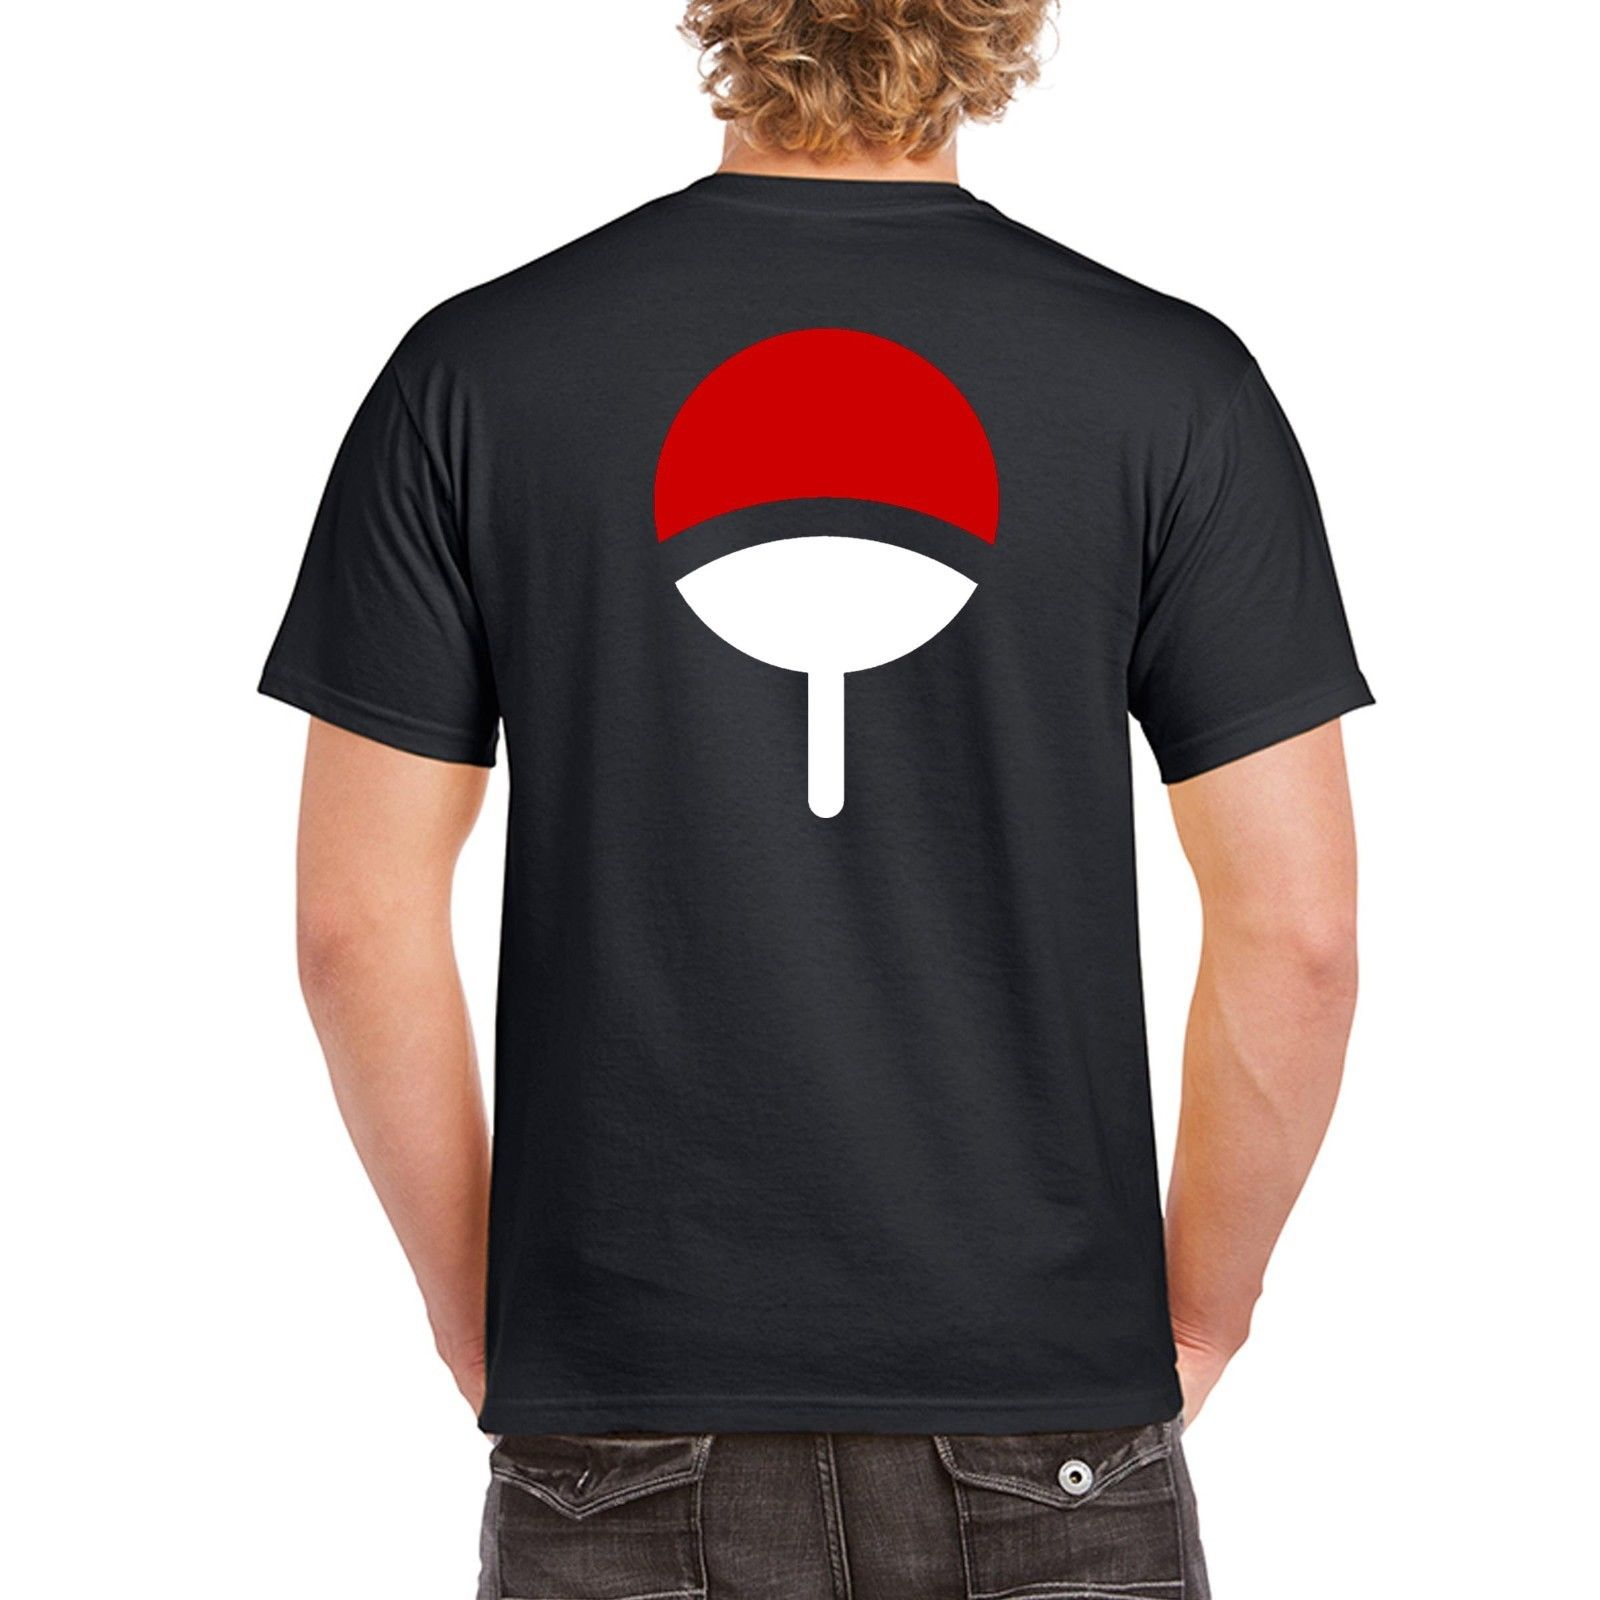 Mens Brand T-shirt Homme Tees Uchiha Clan Symbol Crest Anime Itachi Sasuke Naruto Cosplay Tee T-Shirt Black